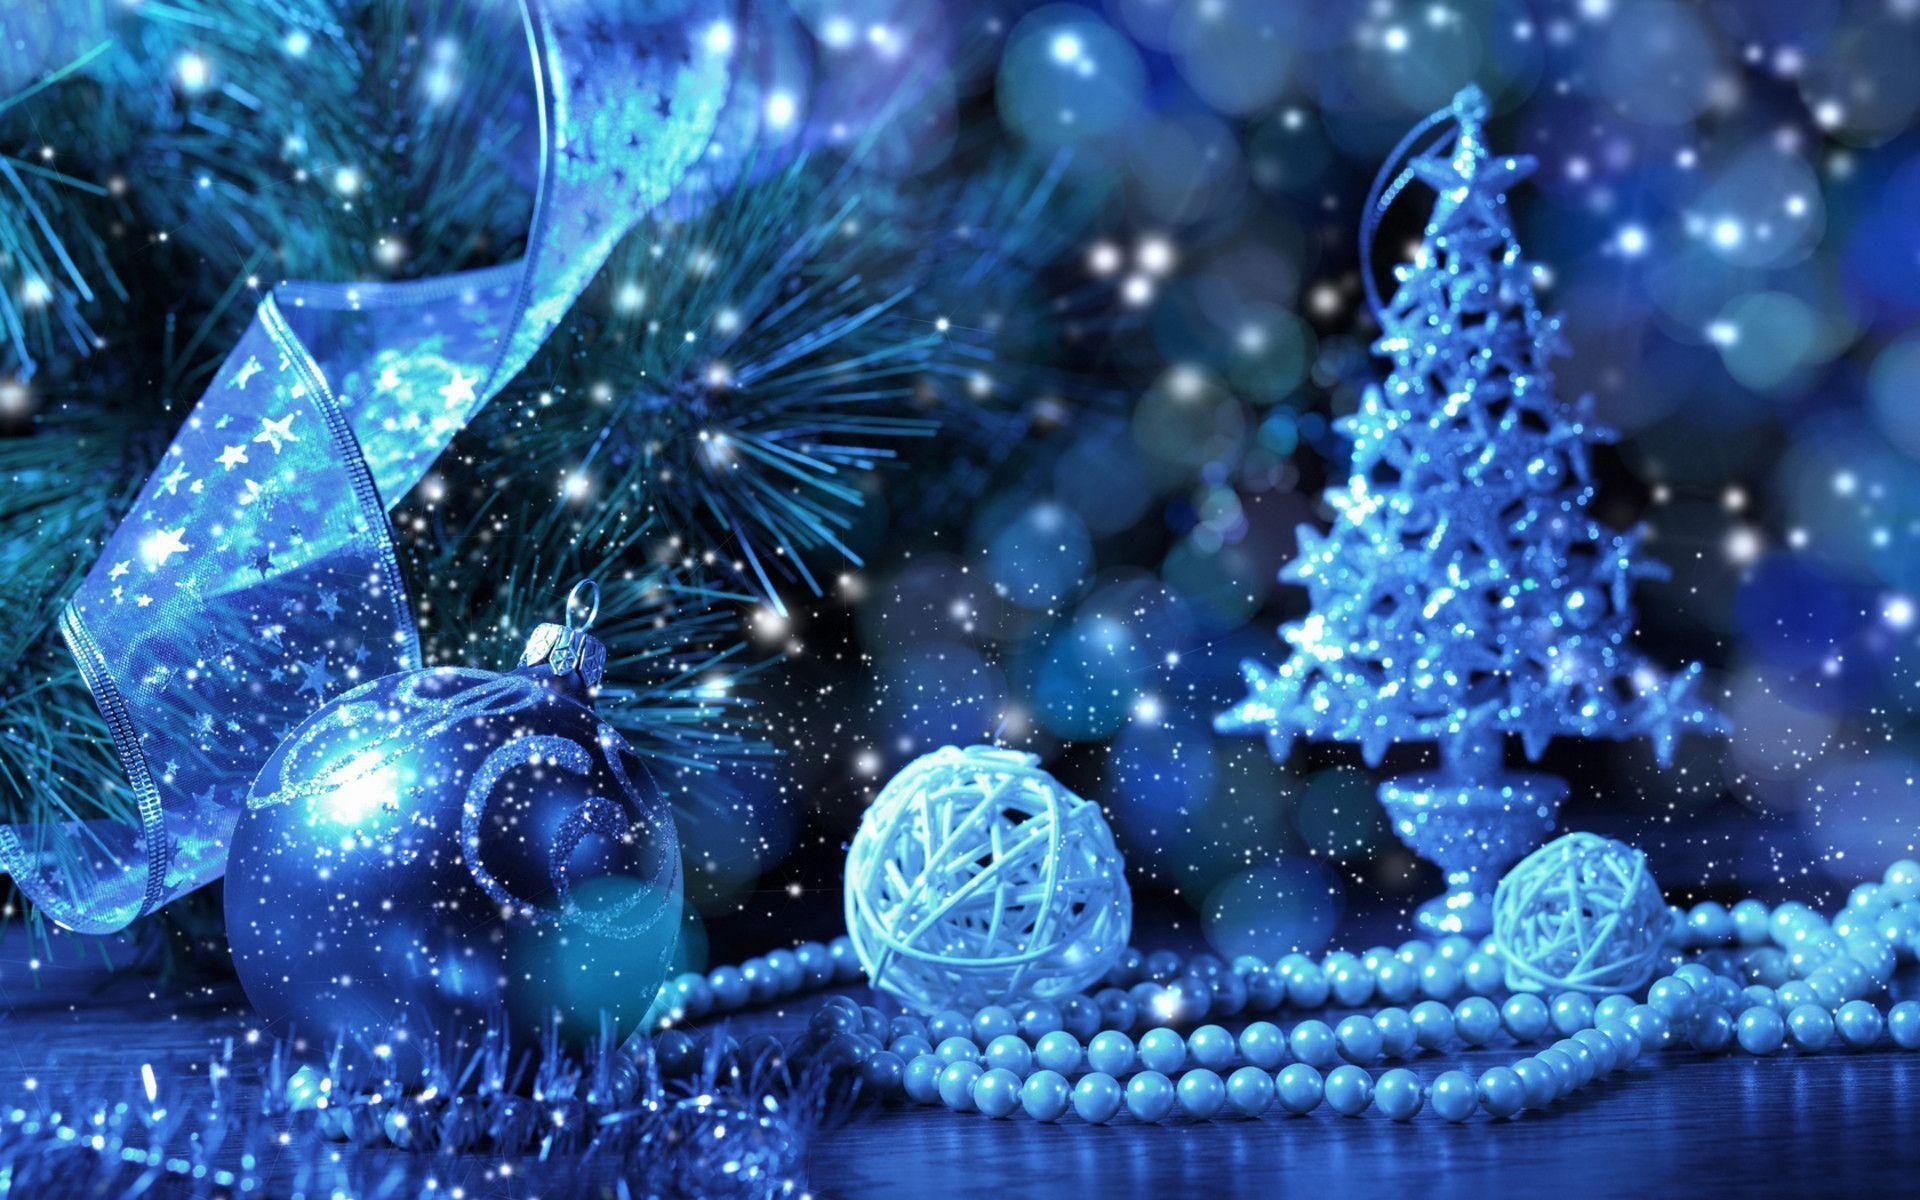 Holidays New Year Christmas Seasonal Wallpaper For Desktop #5489 .